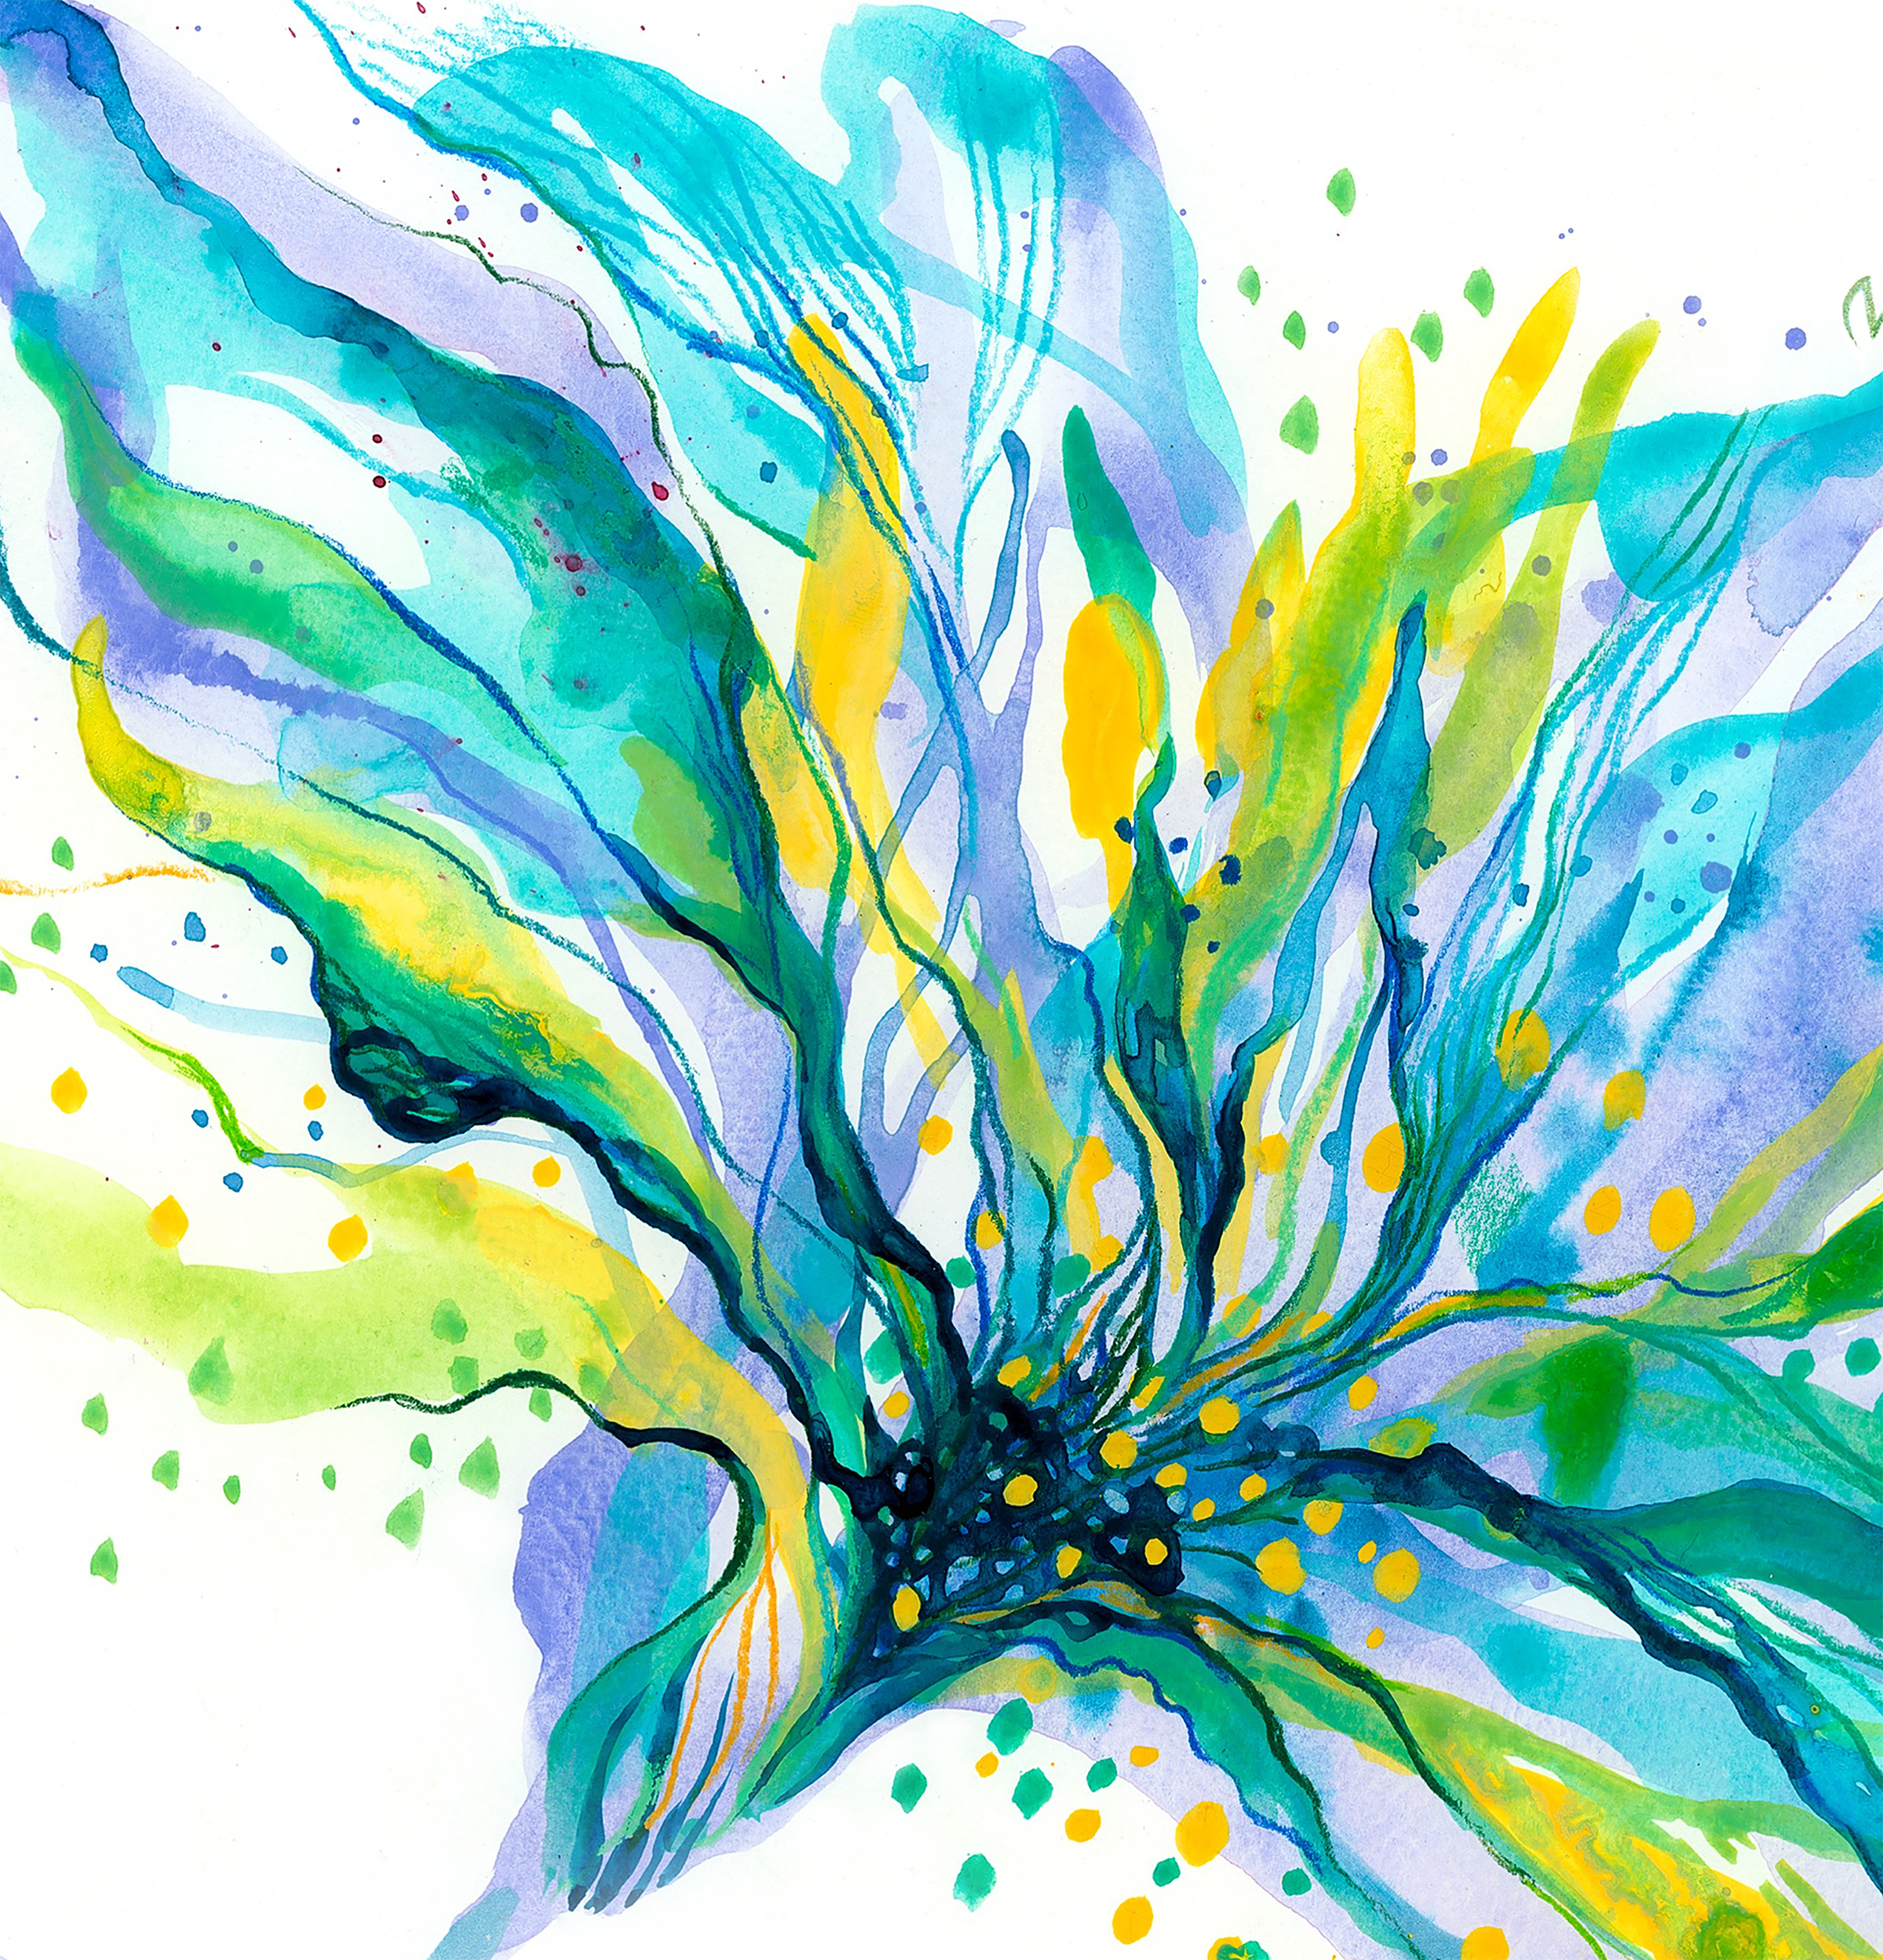 40x40-BlueFlower-ViorikaZagorowska-ArtForSale.s